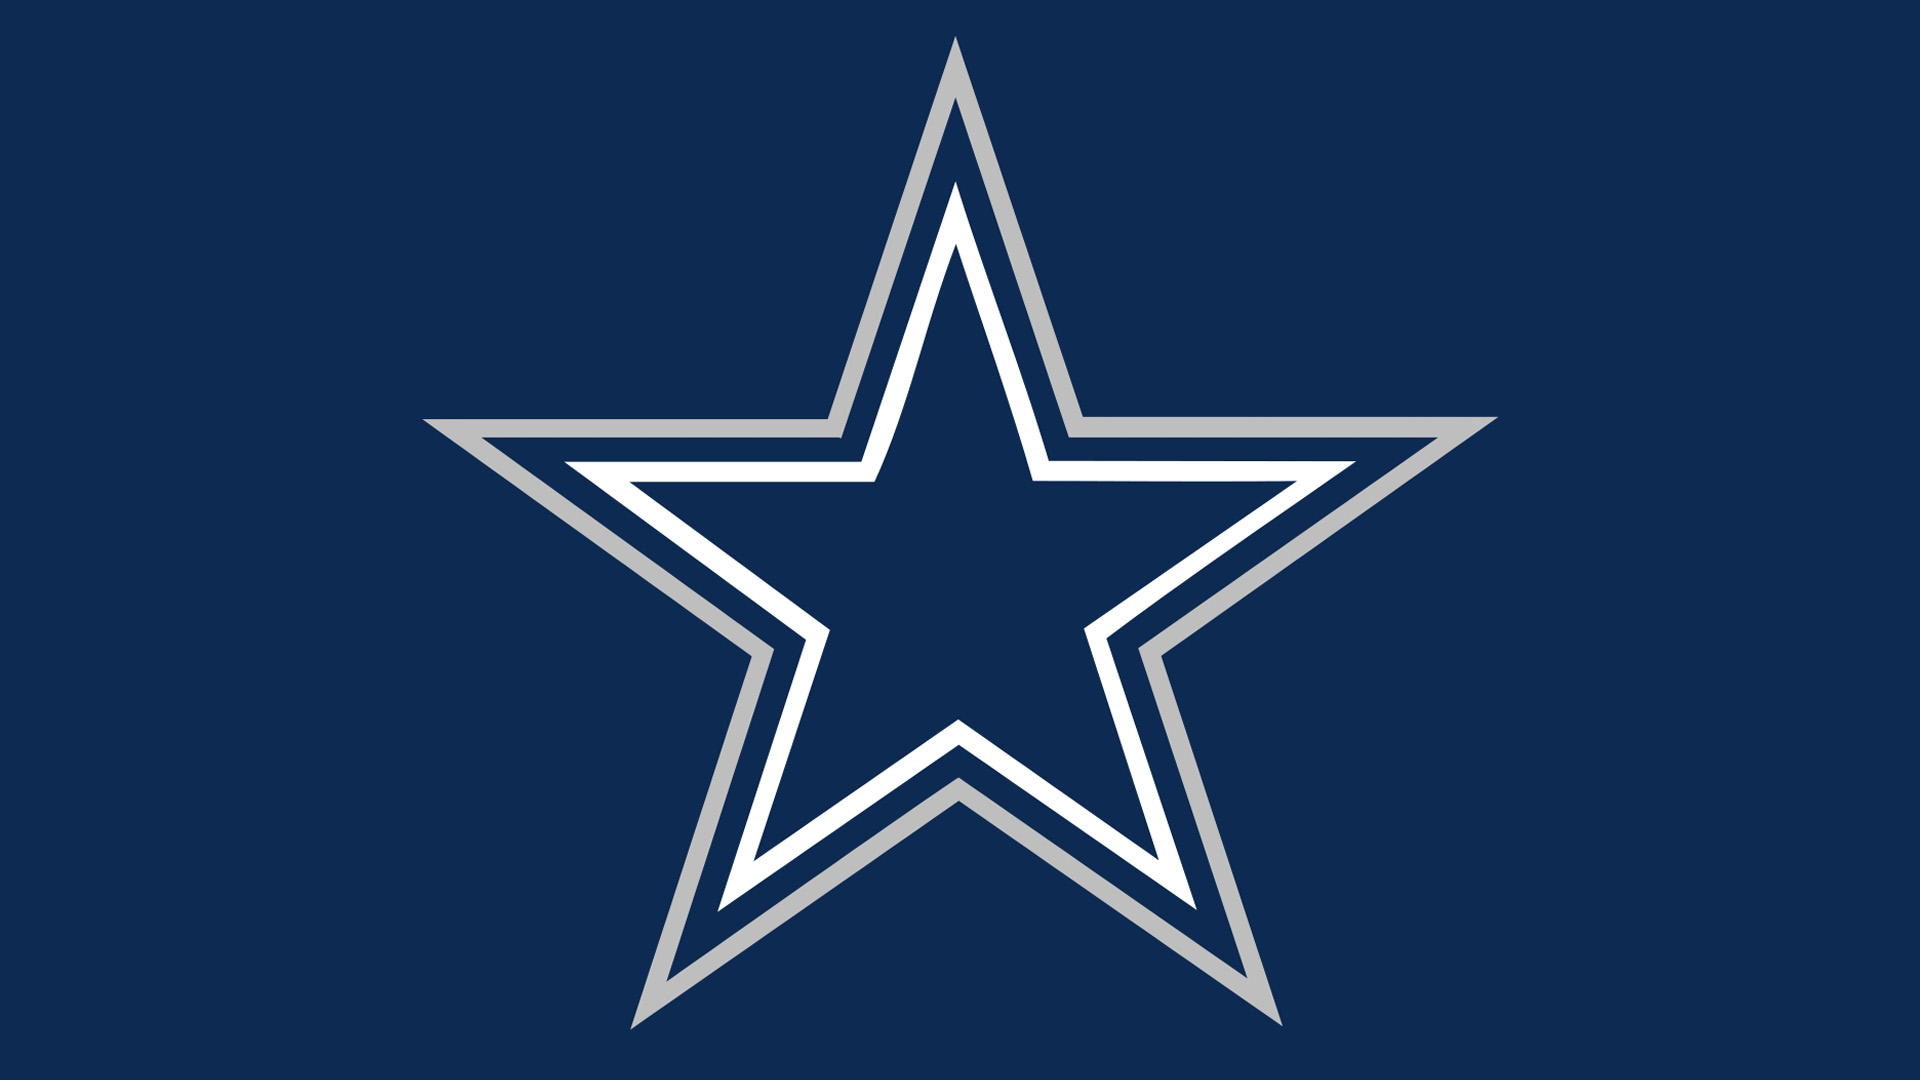 Pin Nfl Dallas Cowboys Blue Star Logo 1920x1080 Hd 1920x1080